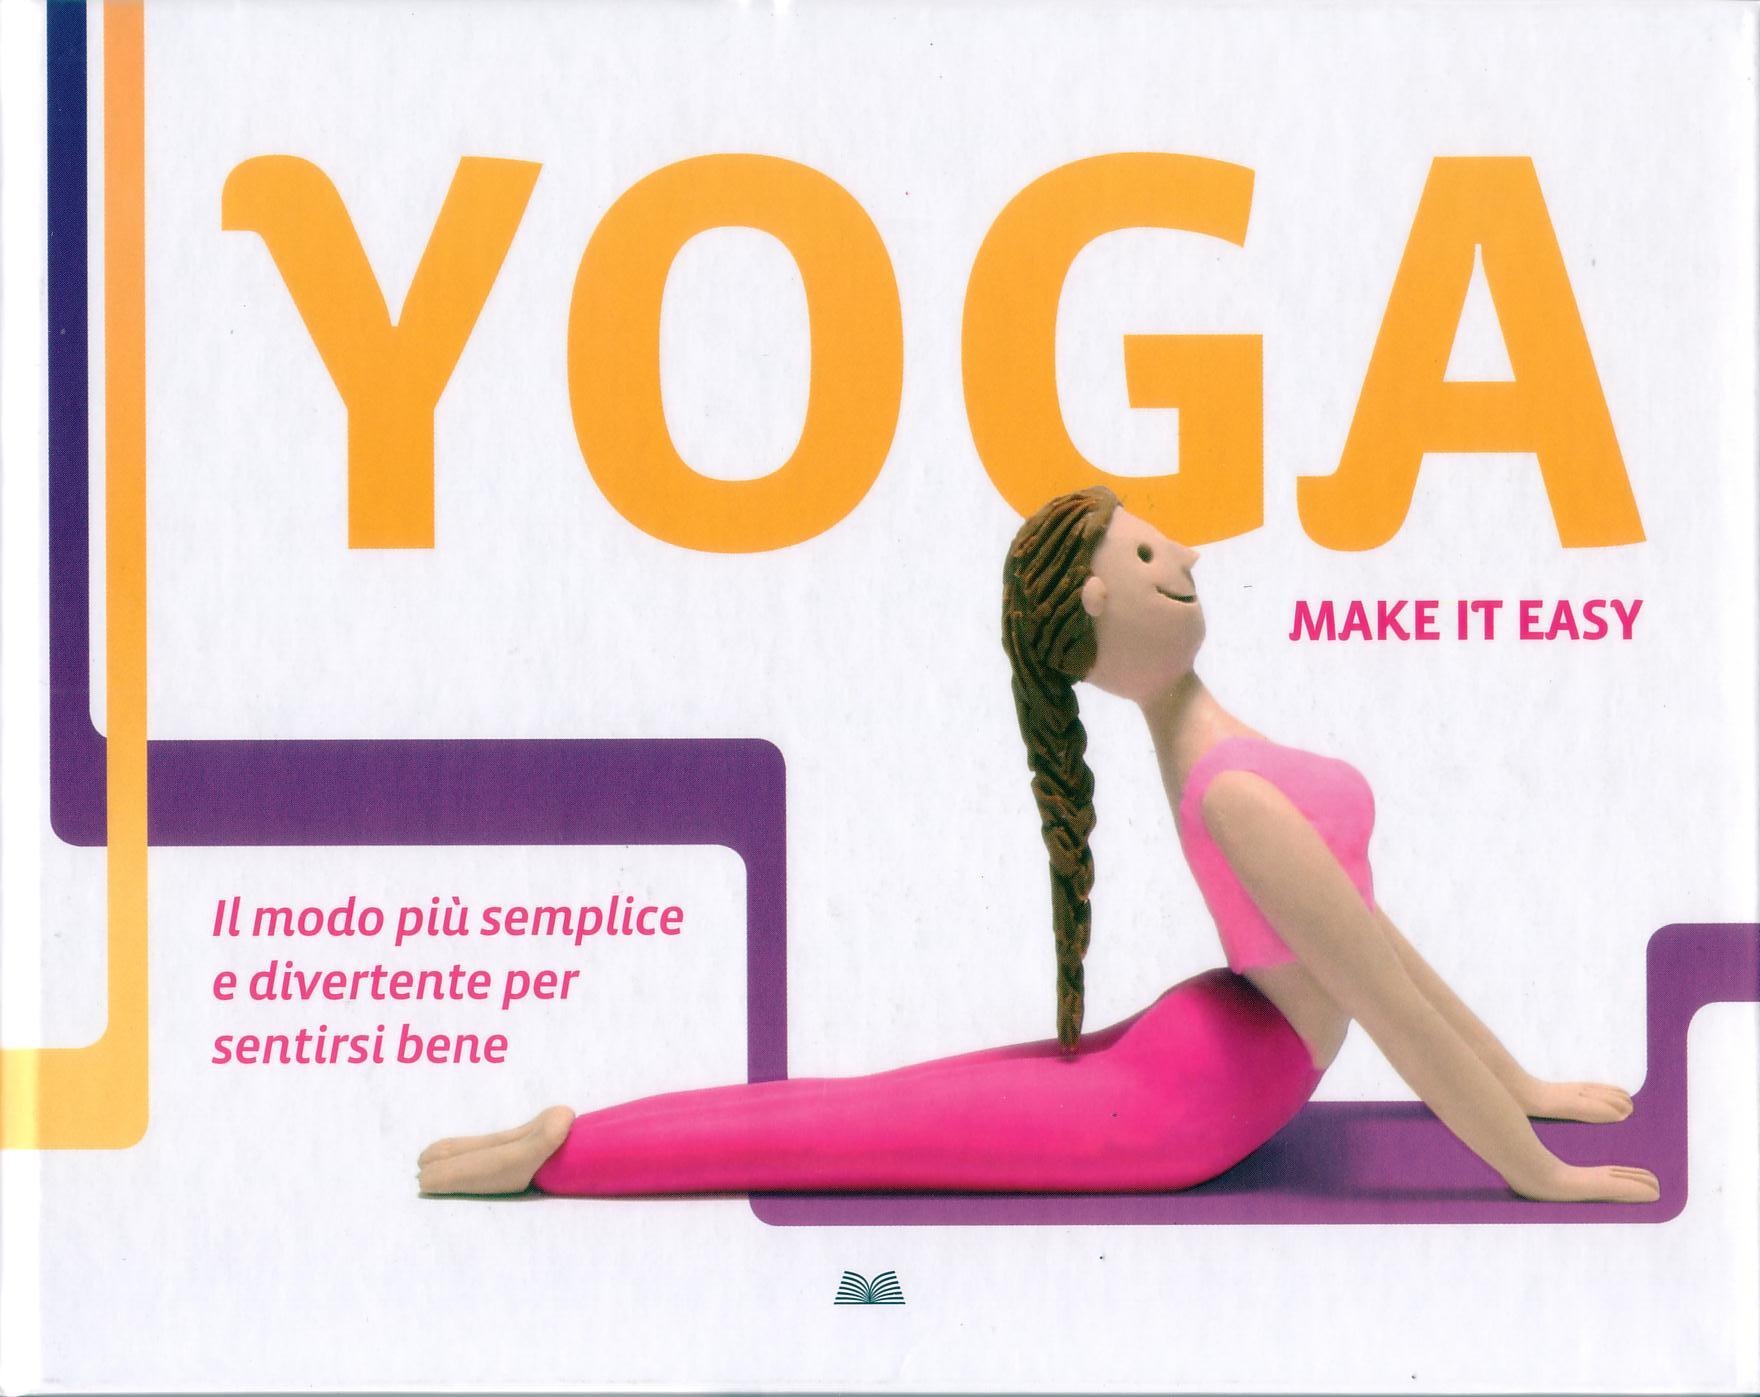 Yoga make it easy